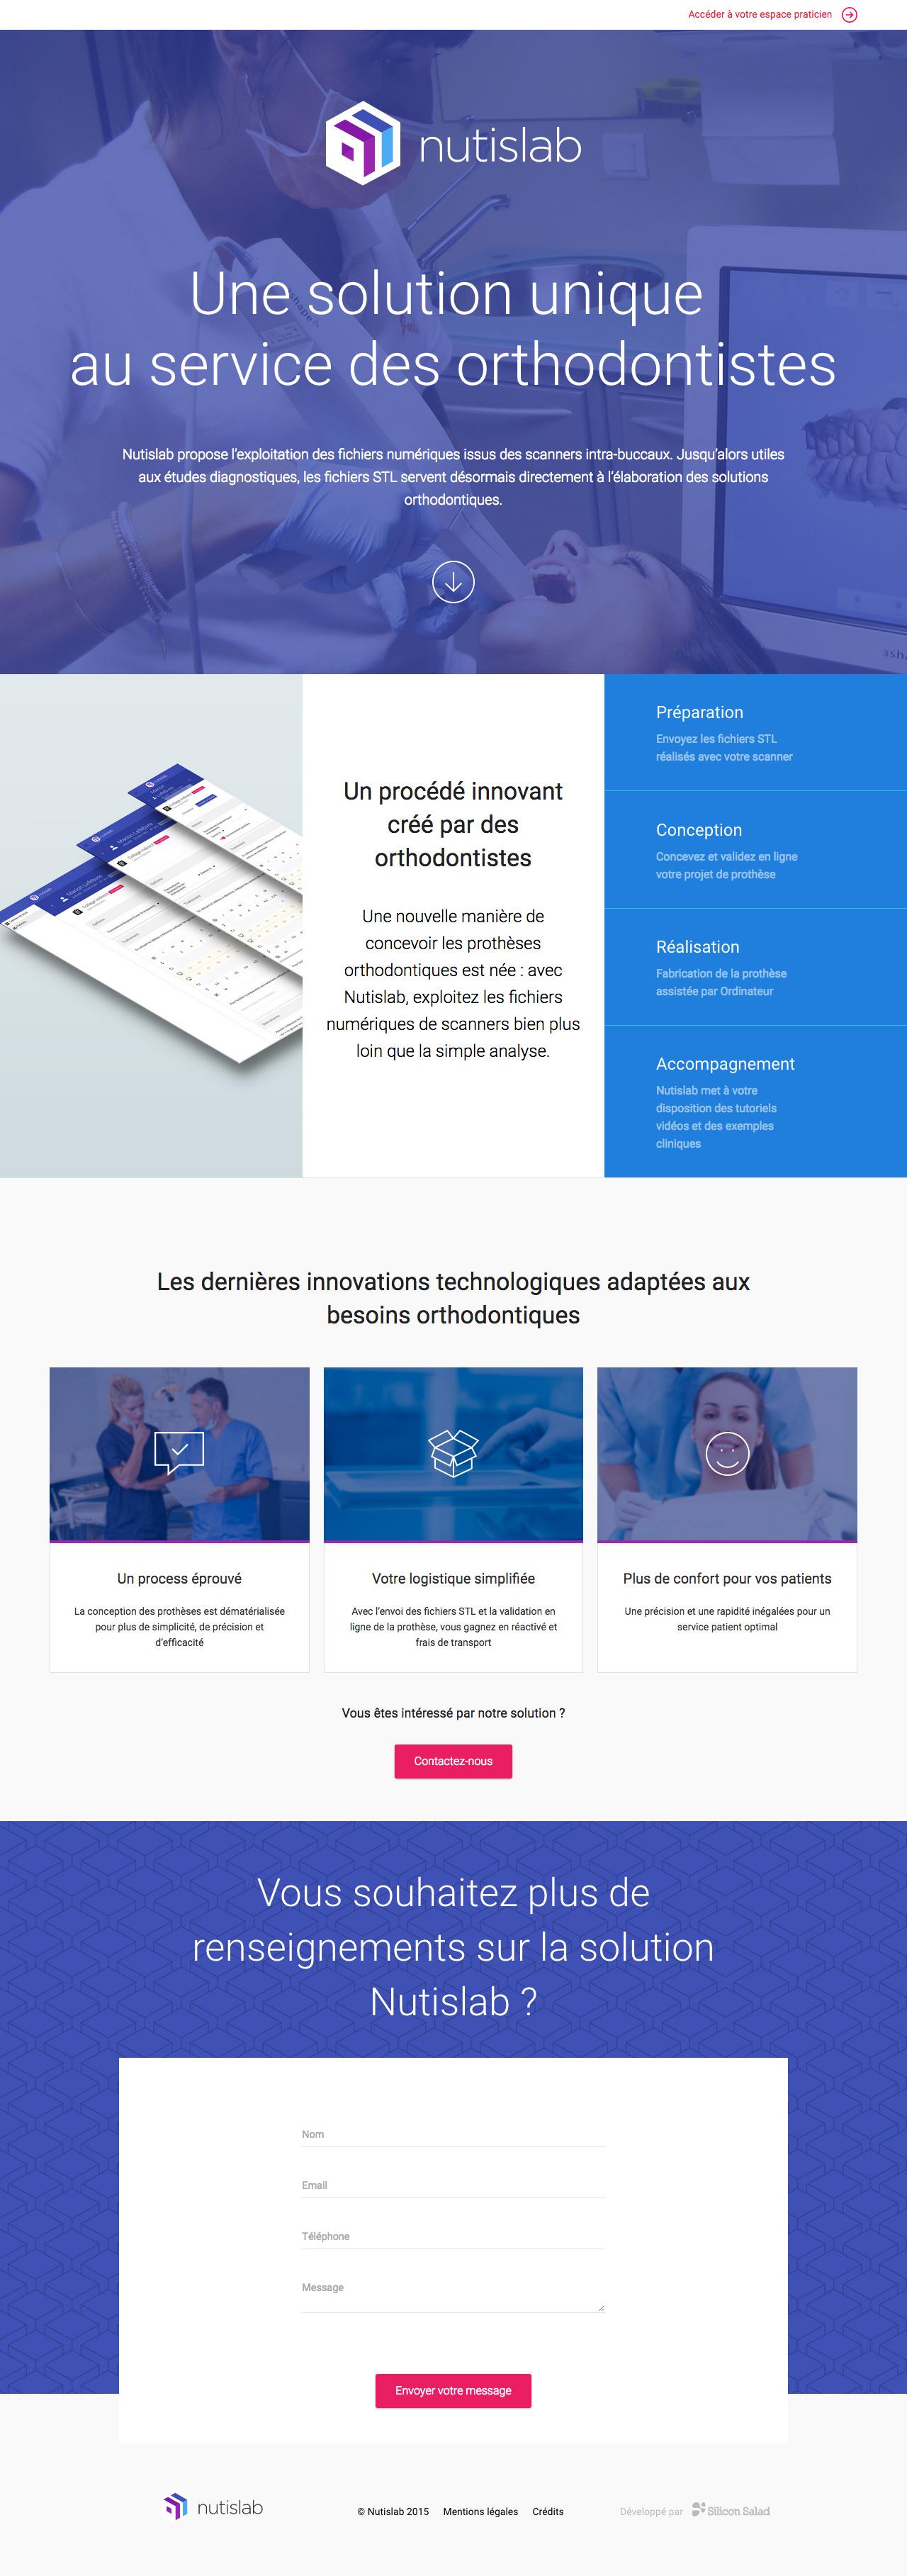 Nutislab Website Screenshot